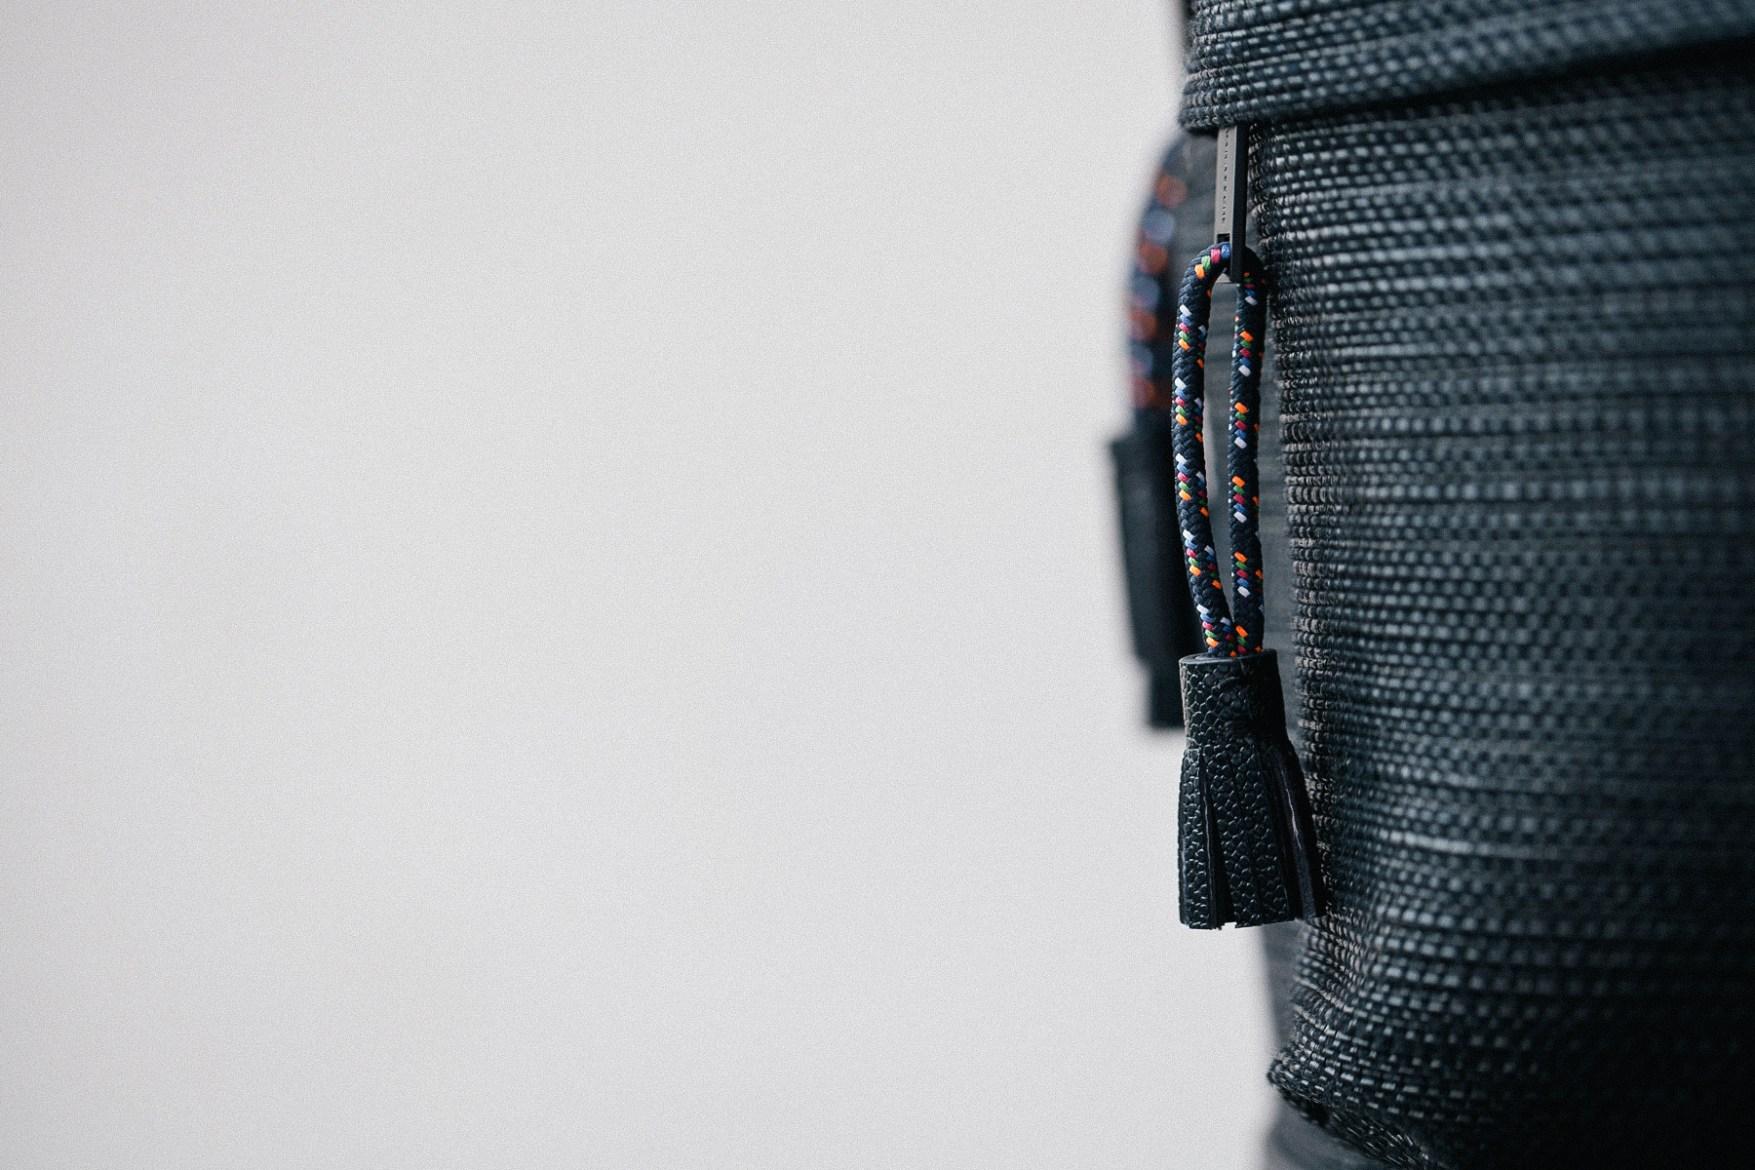 KRISVANASSCHE 2014 Fall/Winter Basket Weave Backpacks